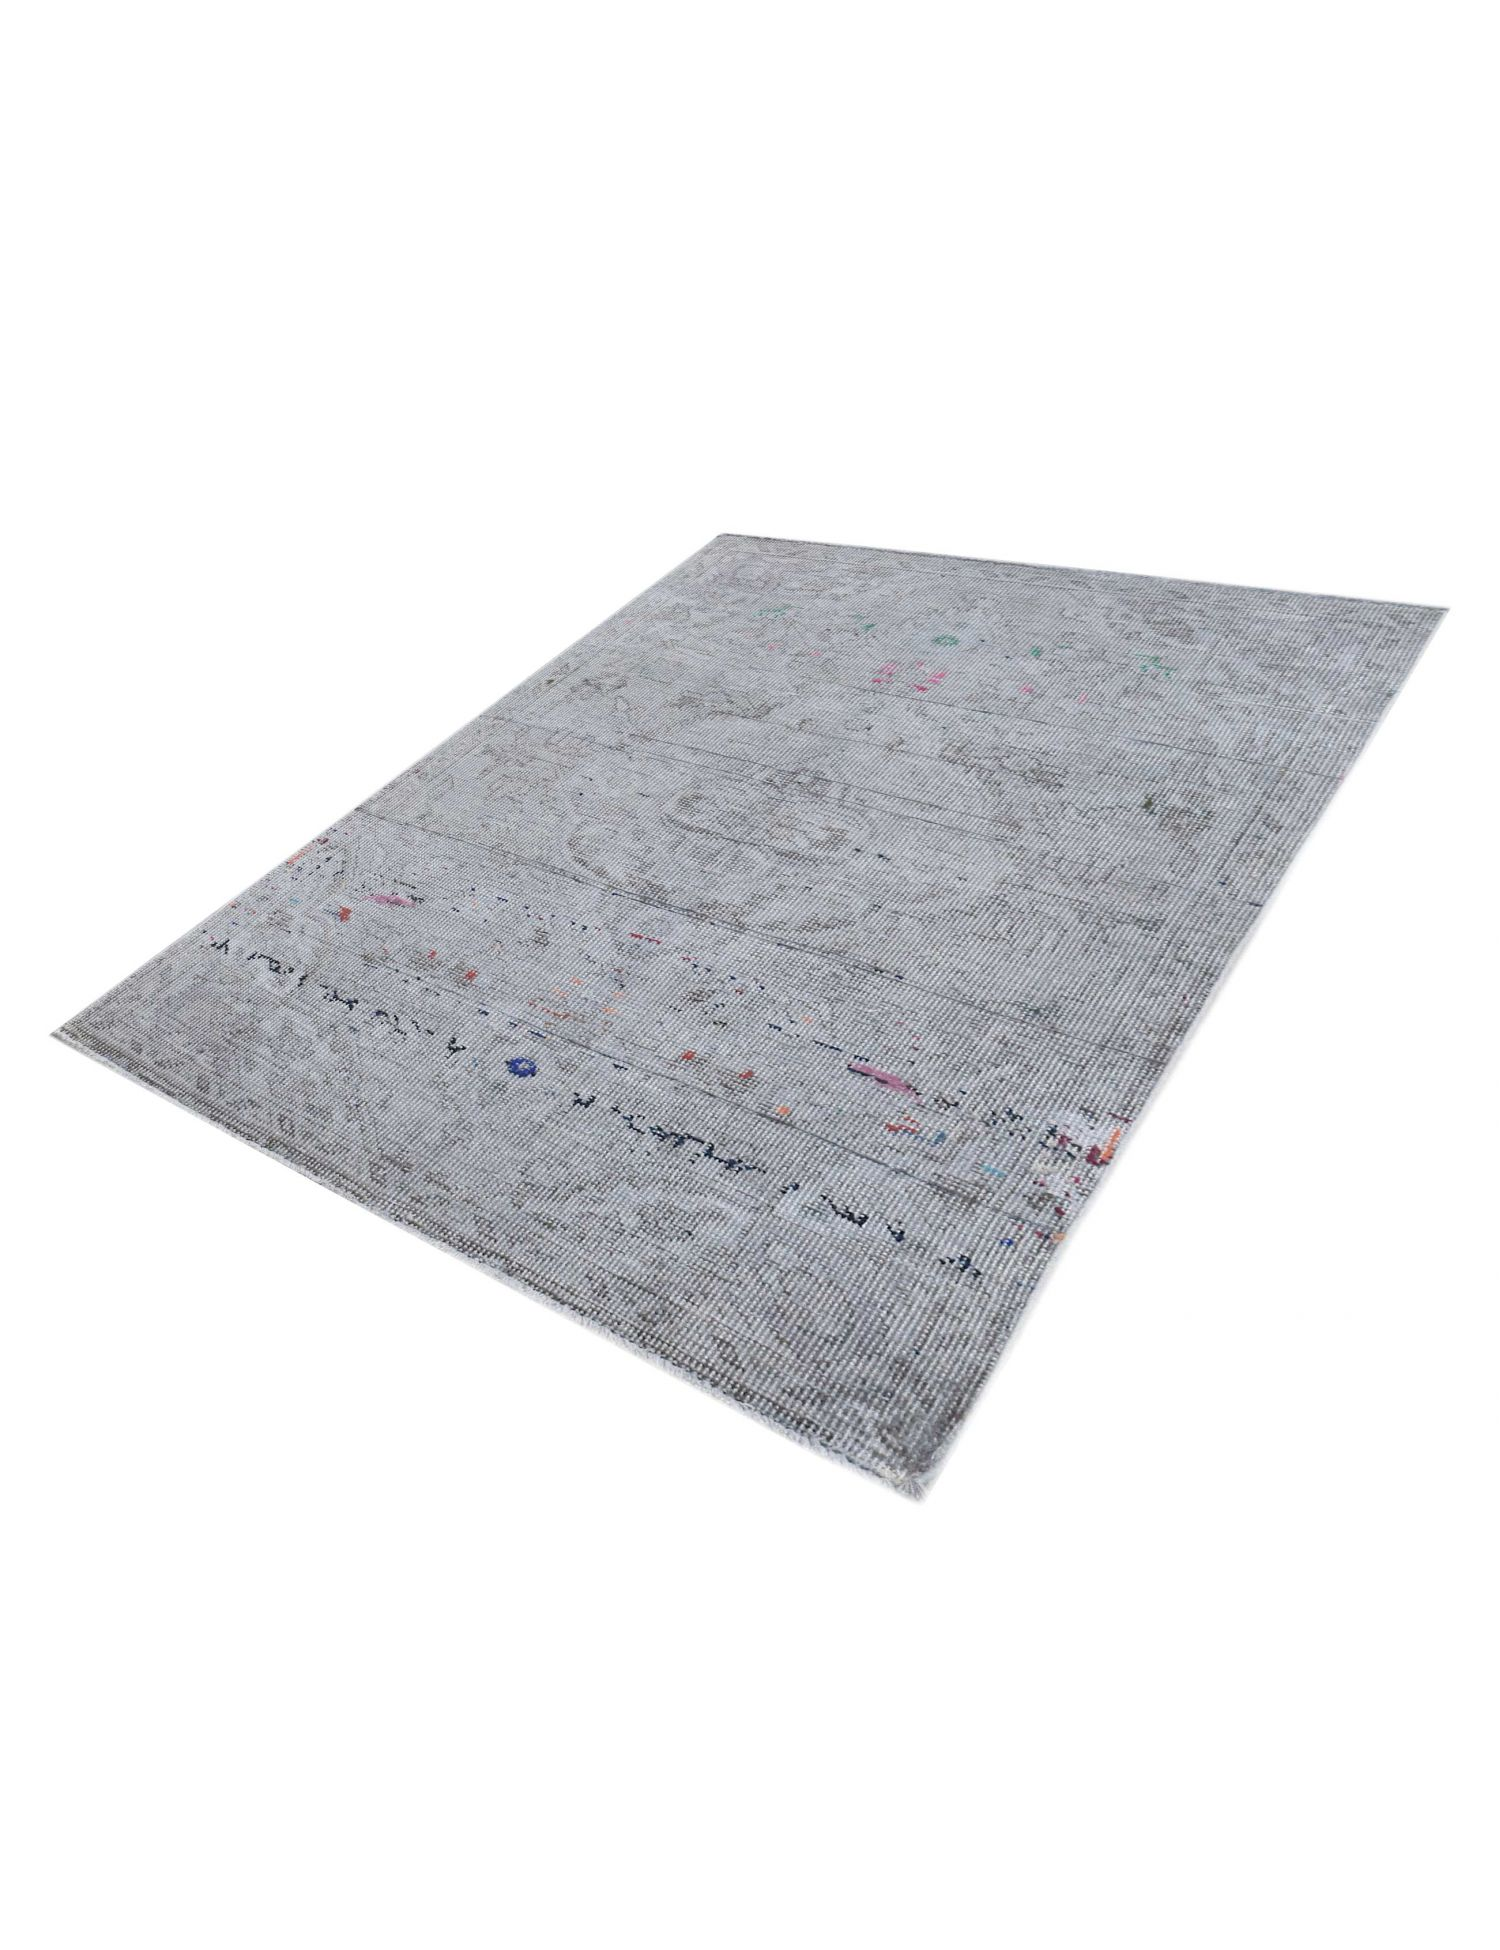 Vintage Perserteppich  grau <br/>135 x 82 cm